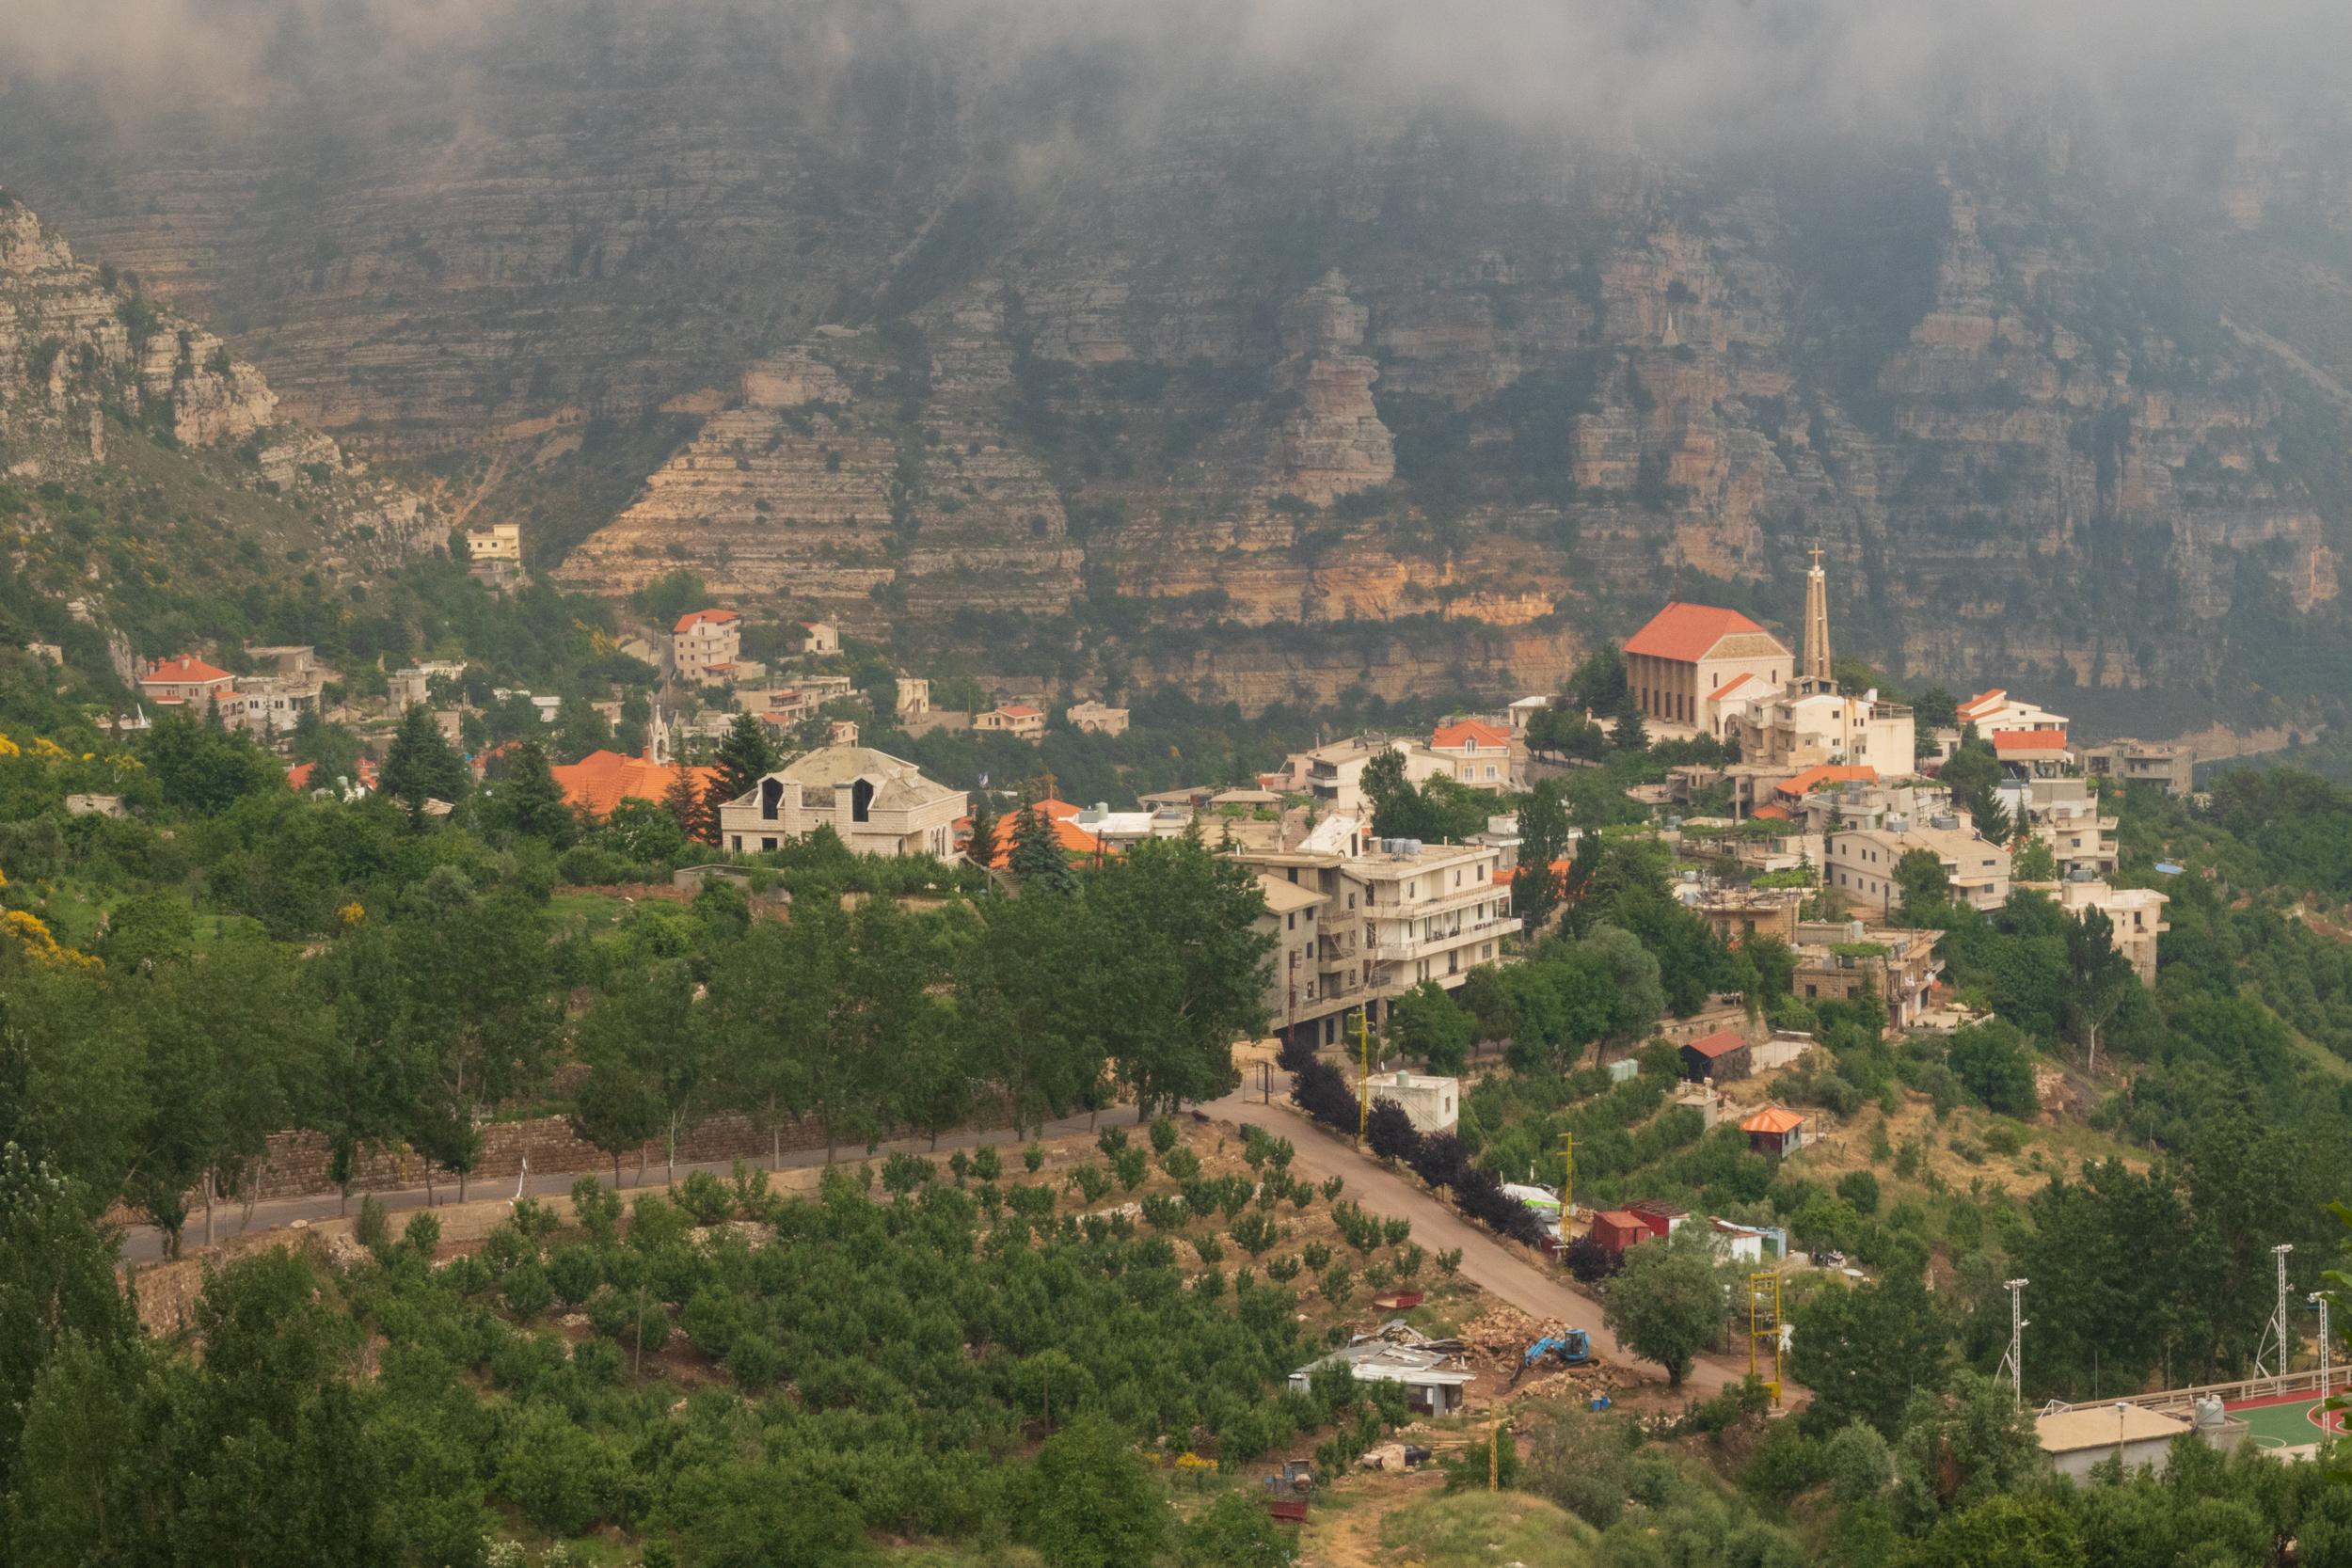 Aqoura, Lebanon